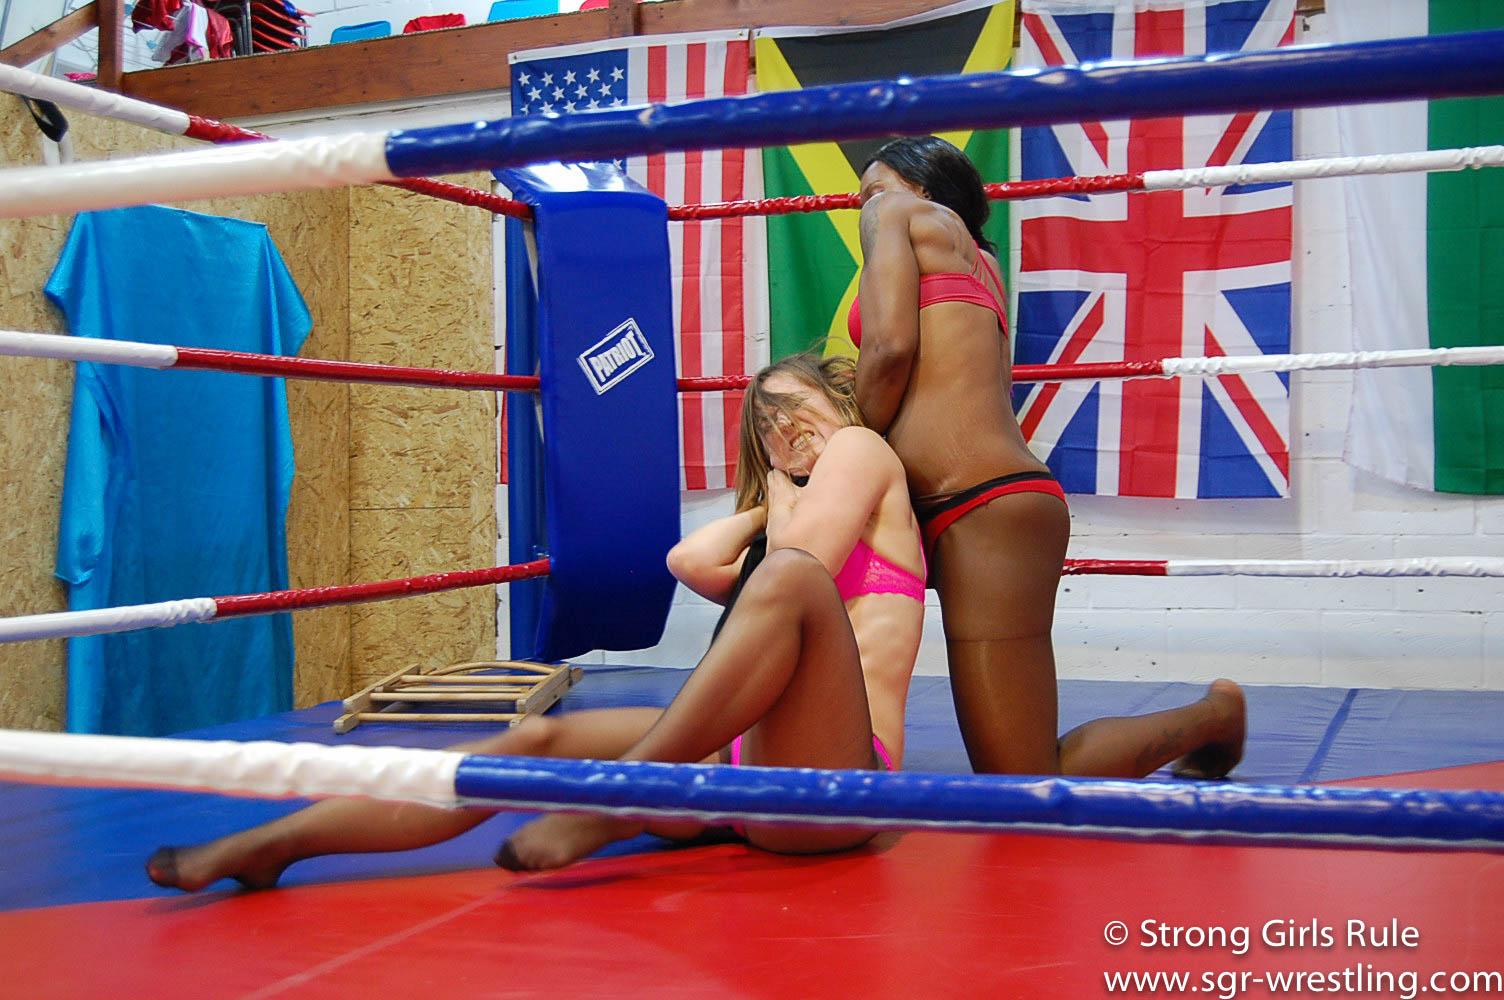 Dirty tactics - Ayesha dominates Scorpion